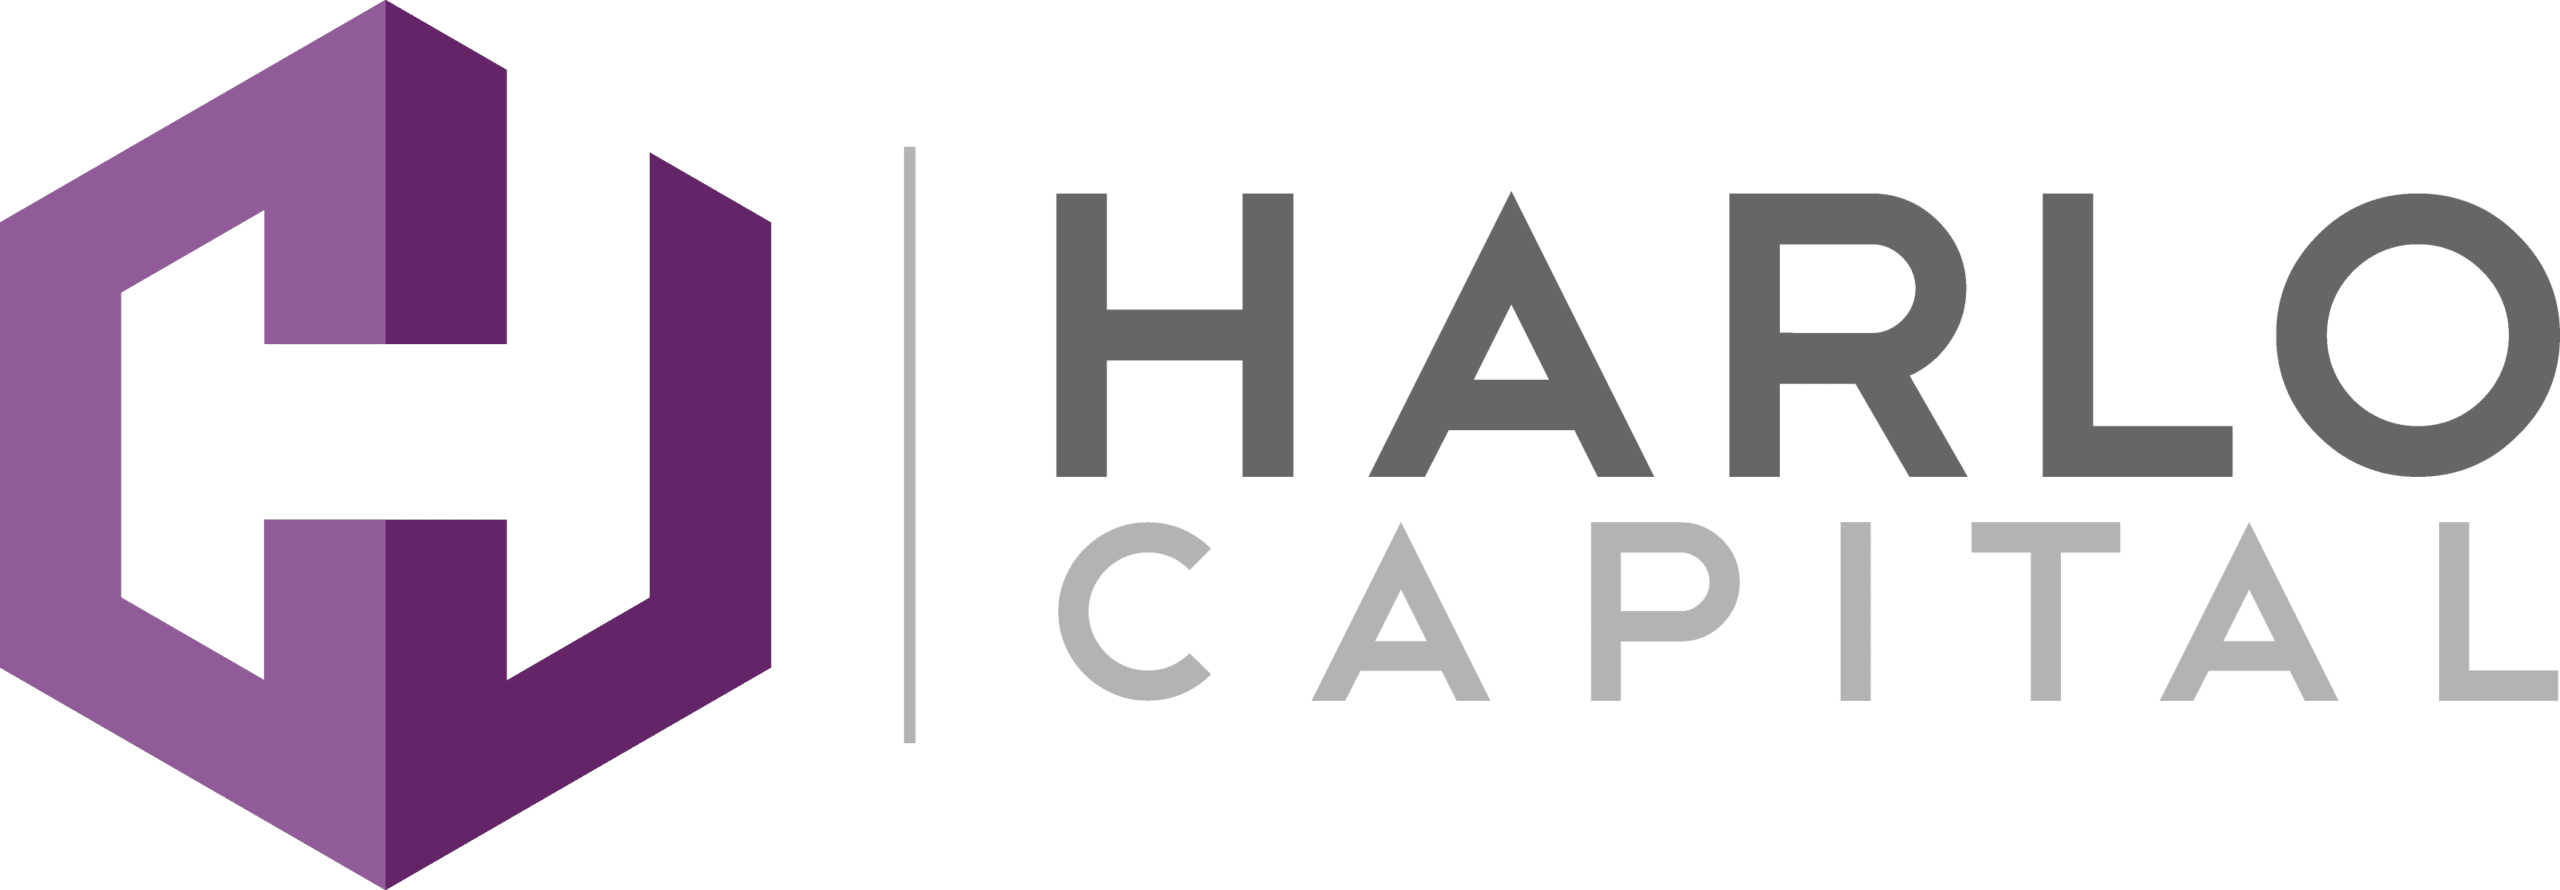 harlo-capital-logo